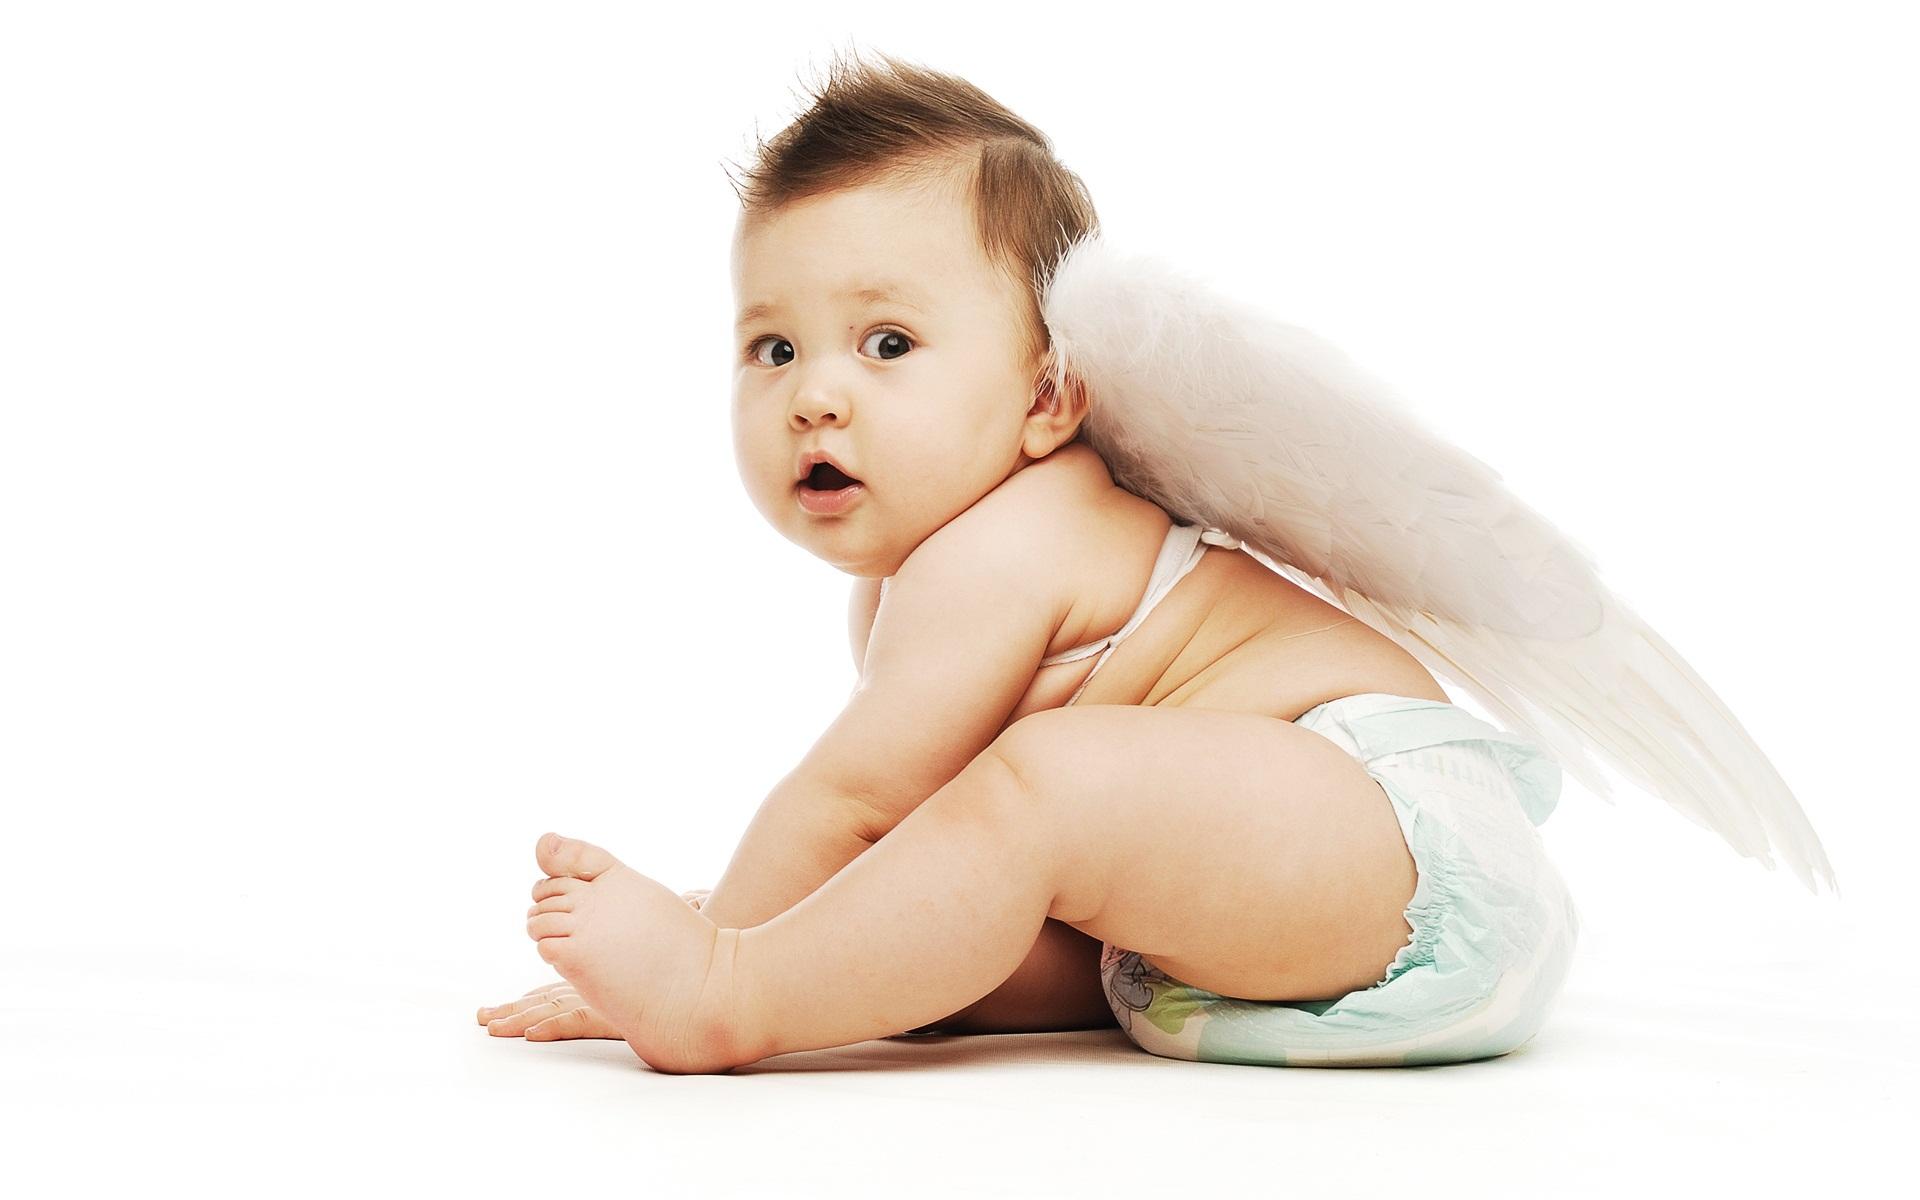 Cute baby desktop wallpapers HD Wallpaper 1920x1200